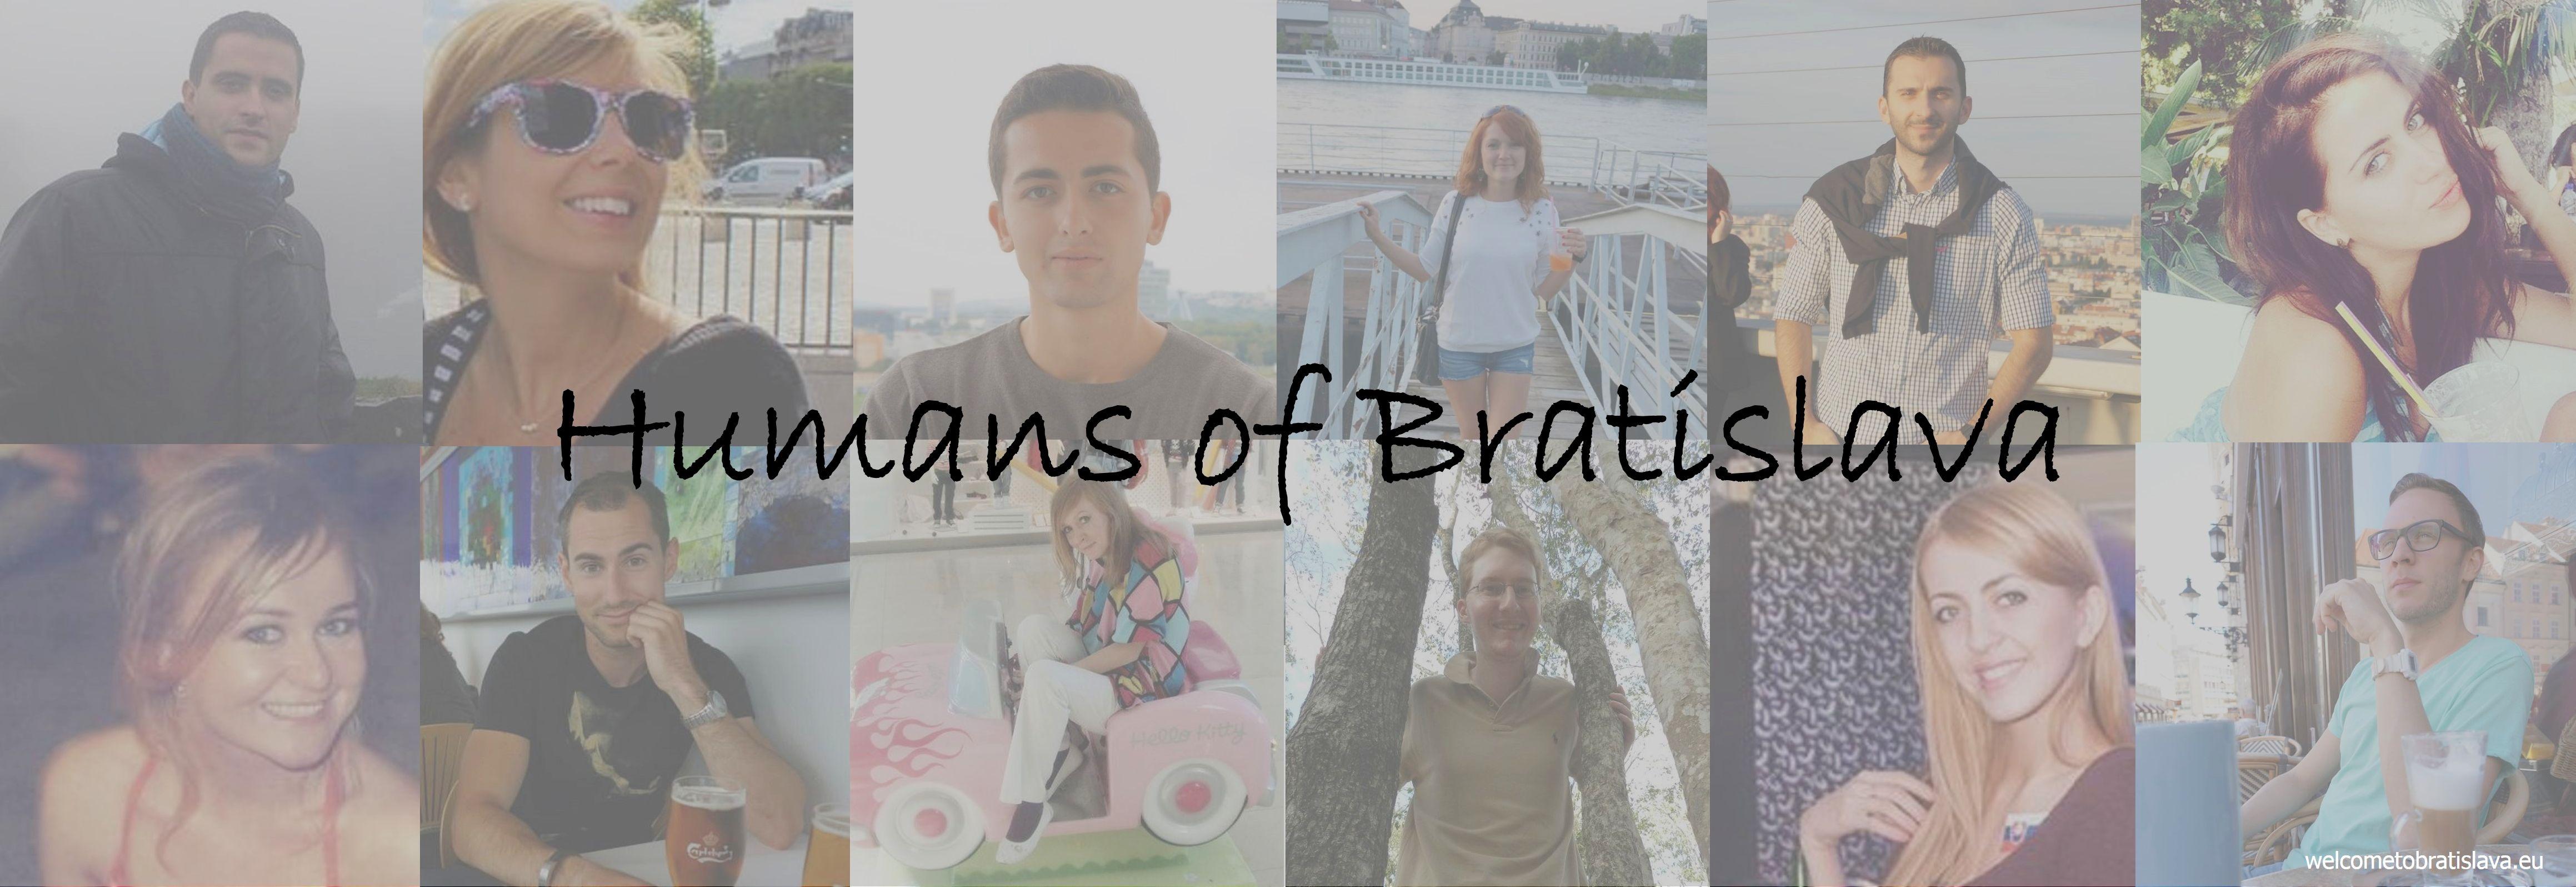 Humans of Bratislava